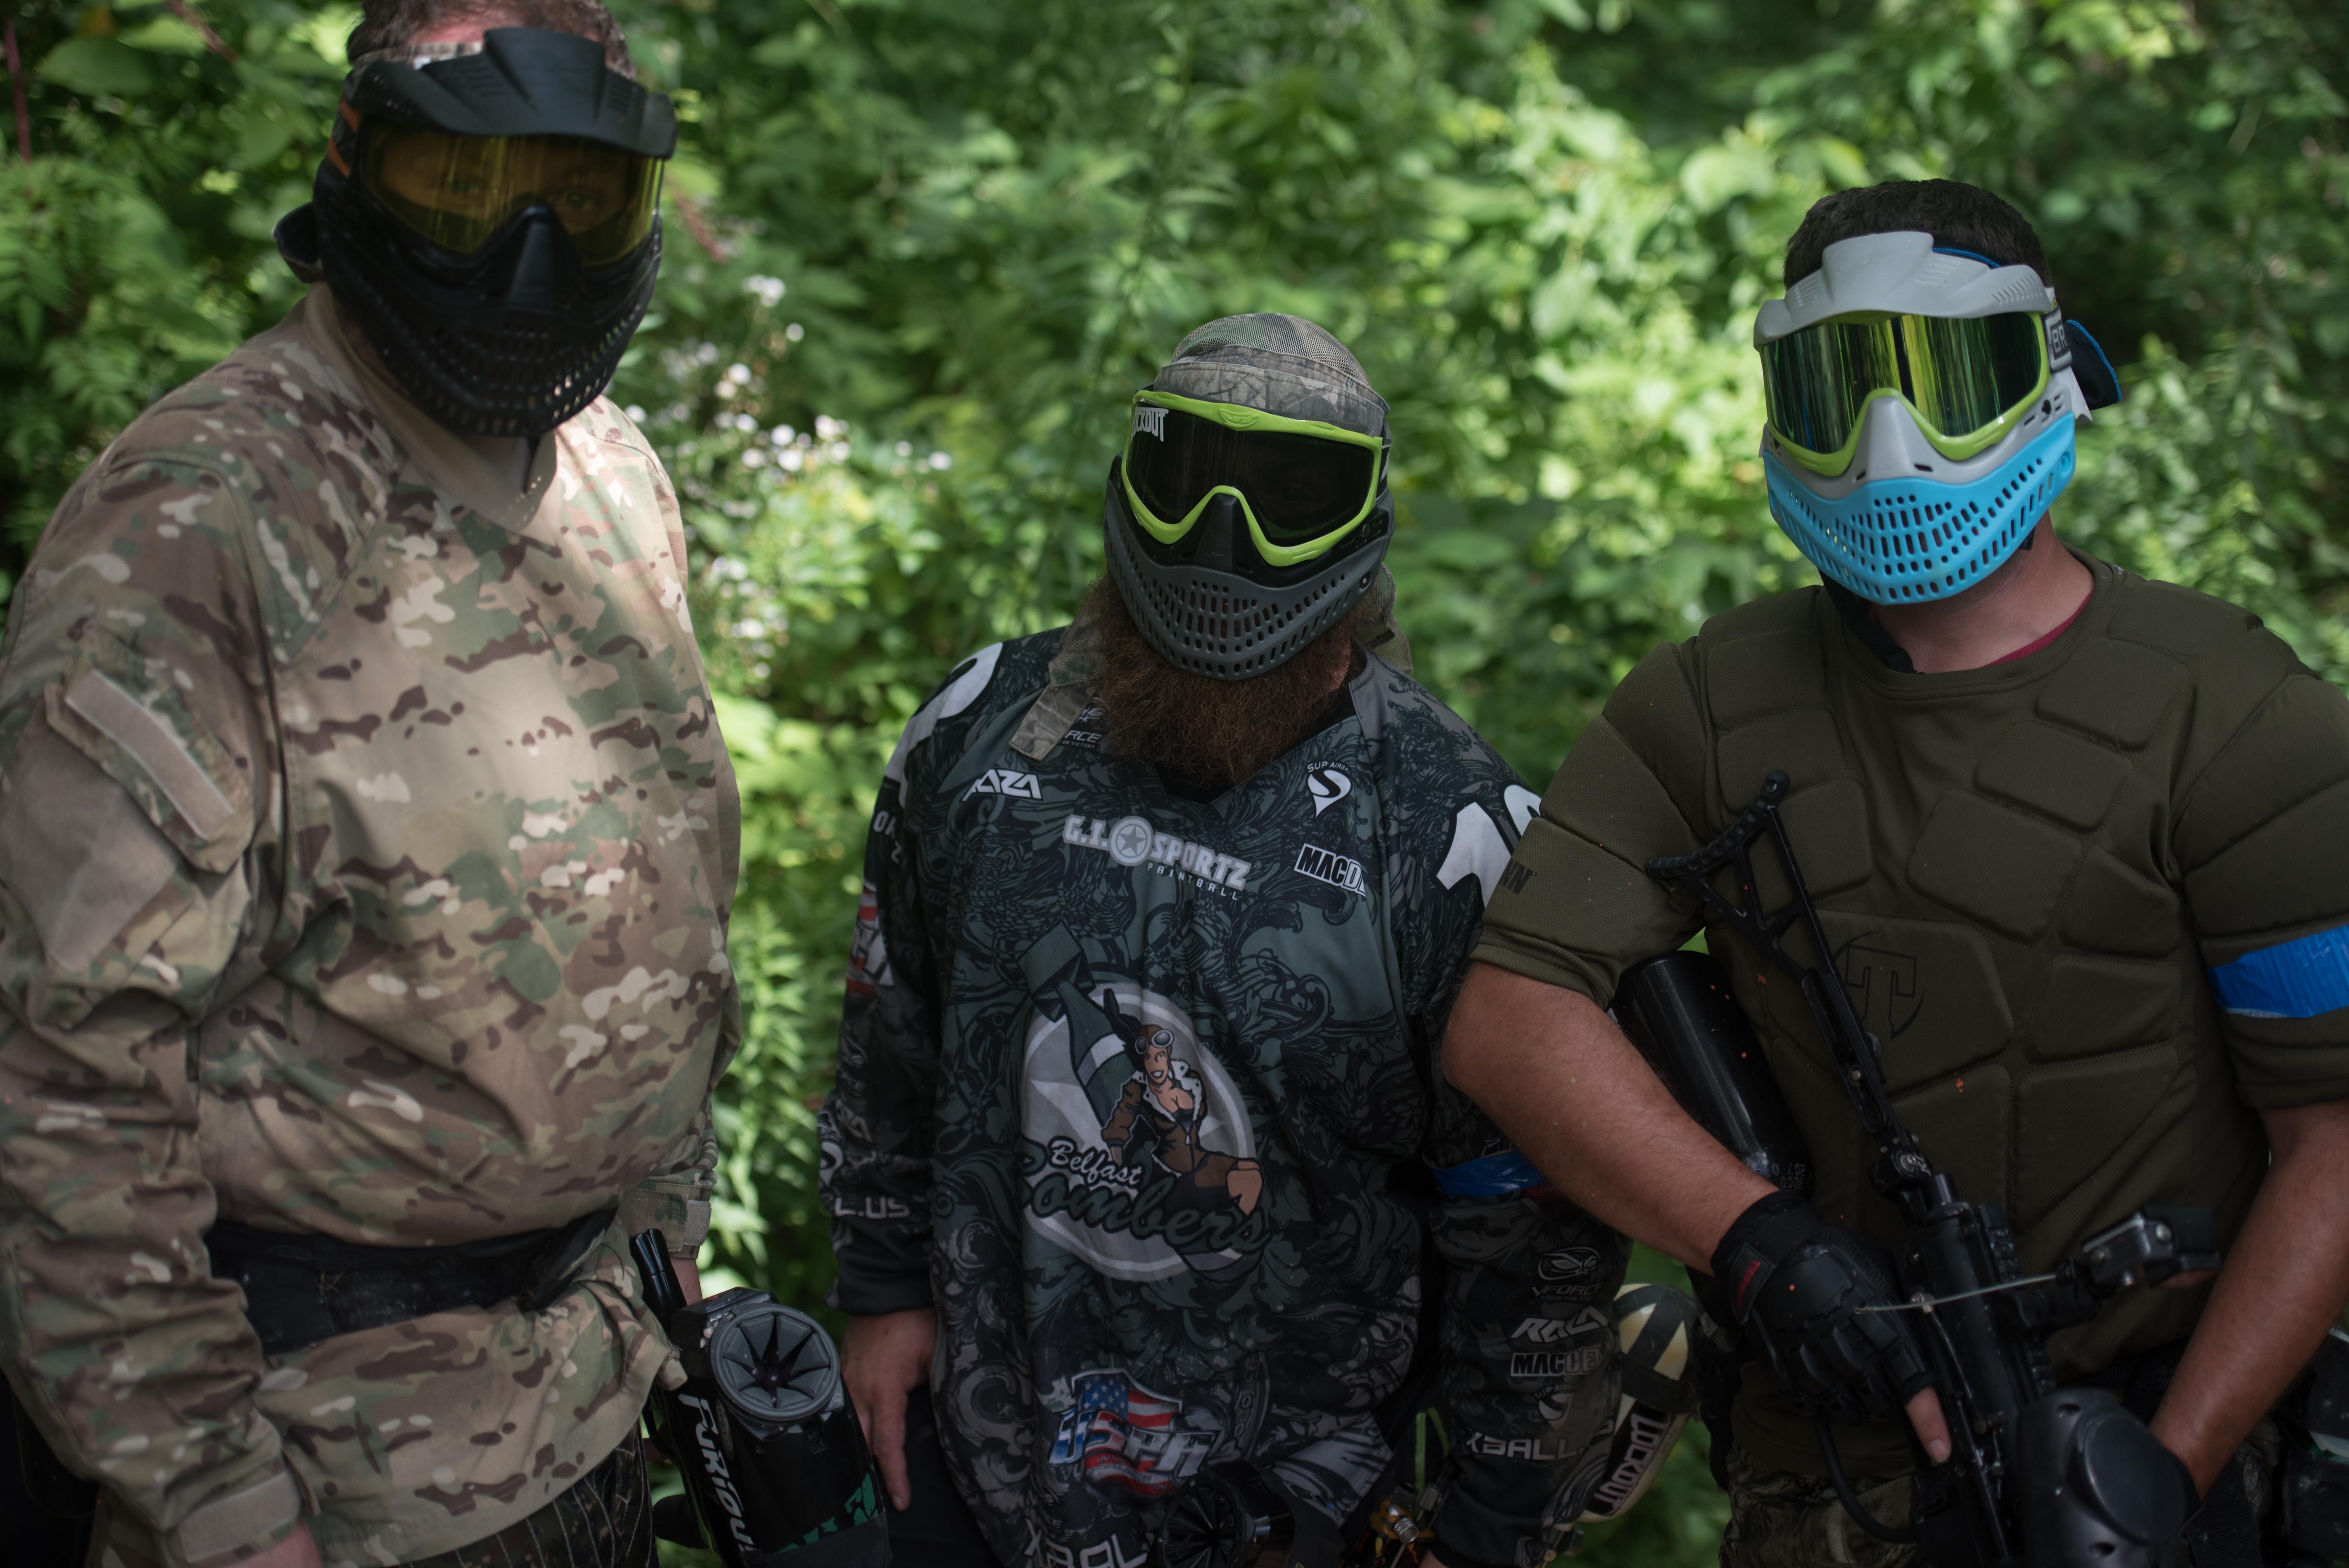 Battle Of Bunker Hill 2017